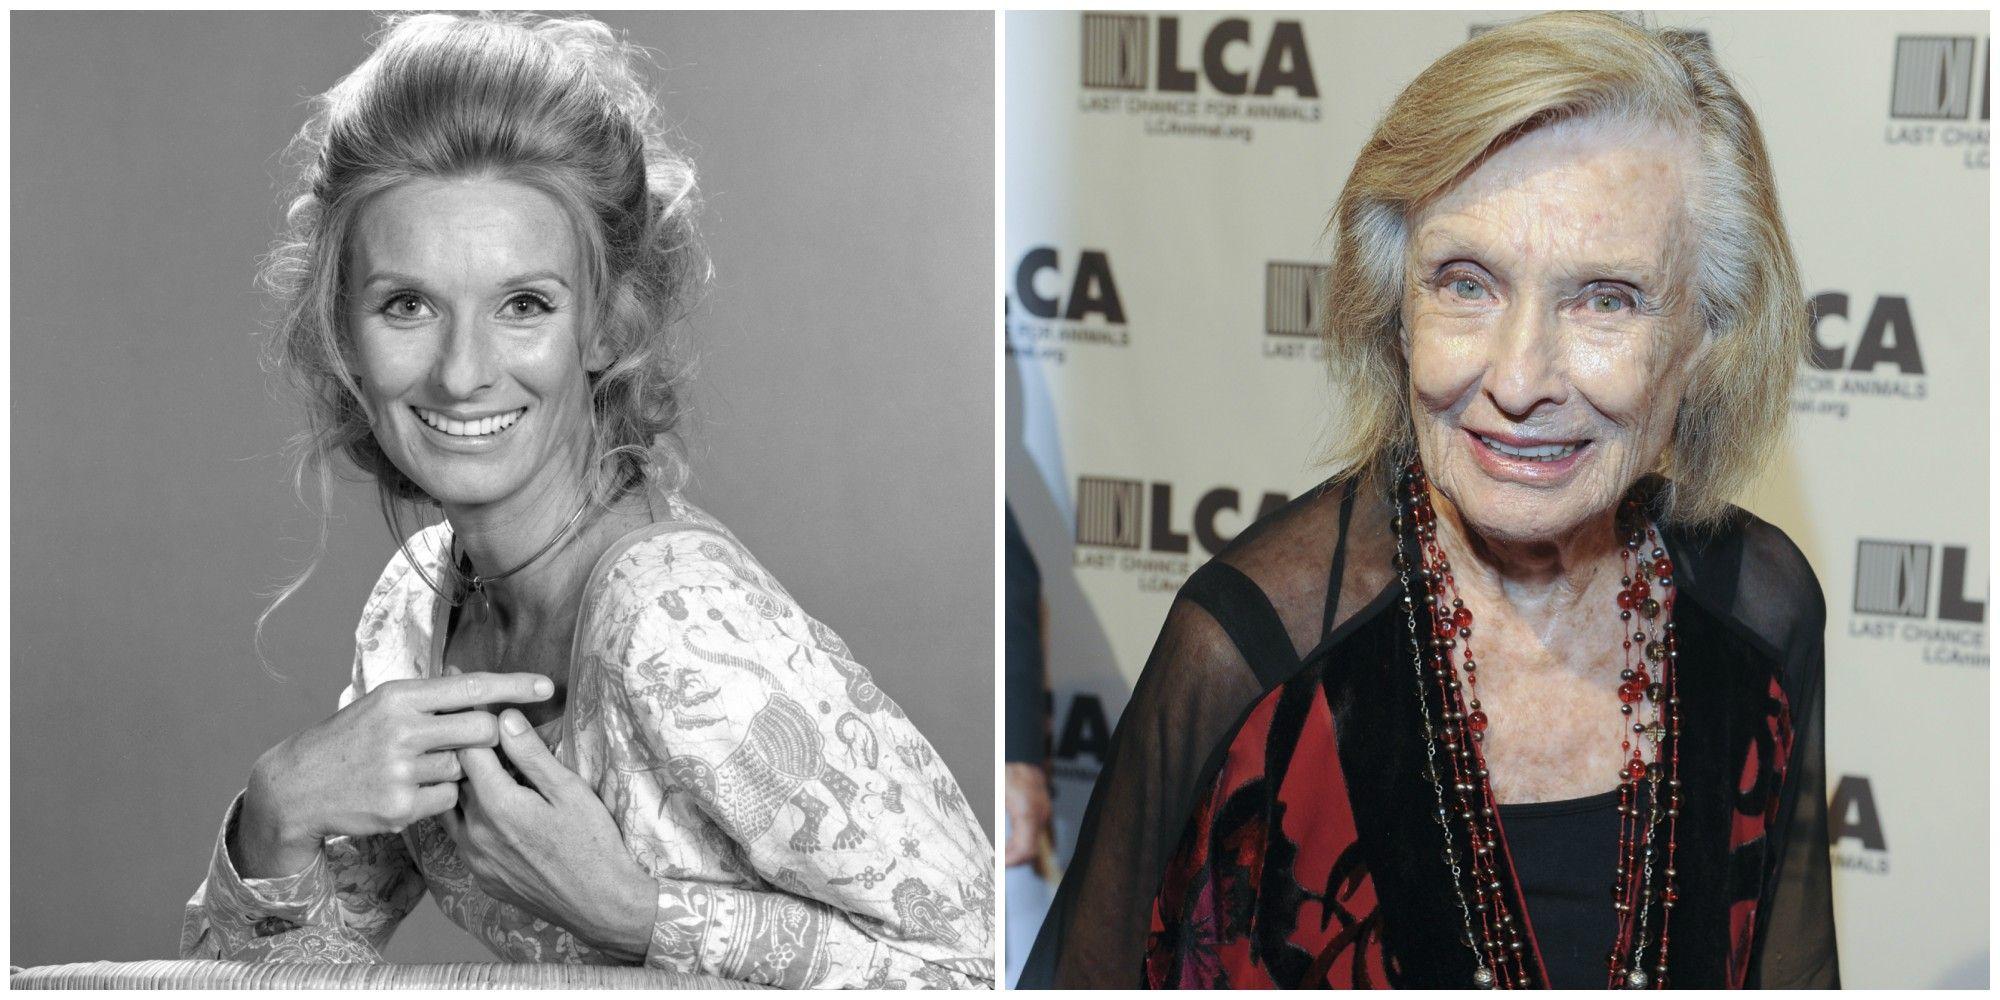 Photos of Old Celebrities - Movie Stars Over 80